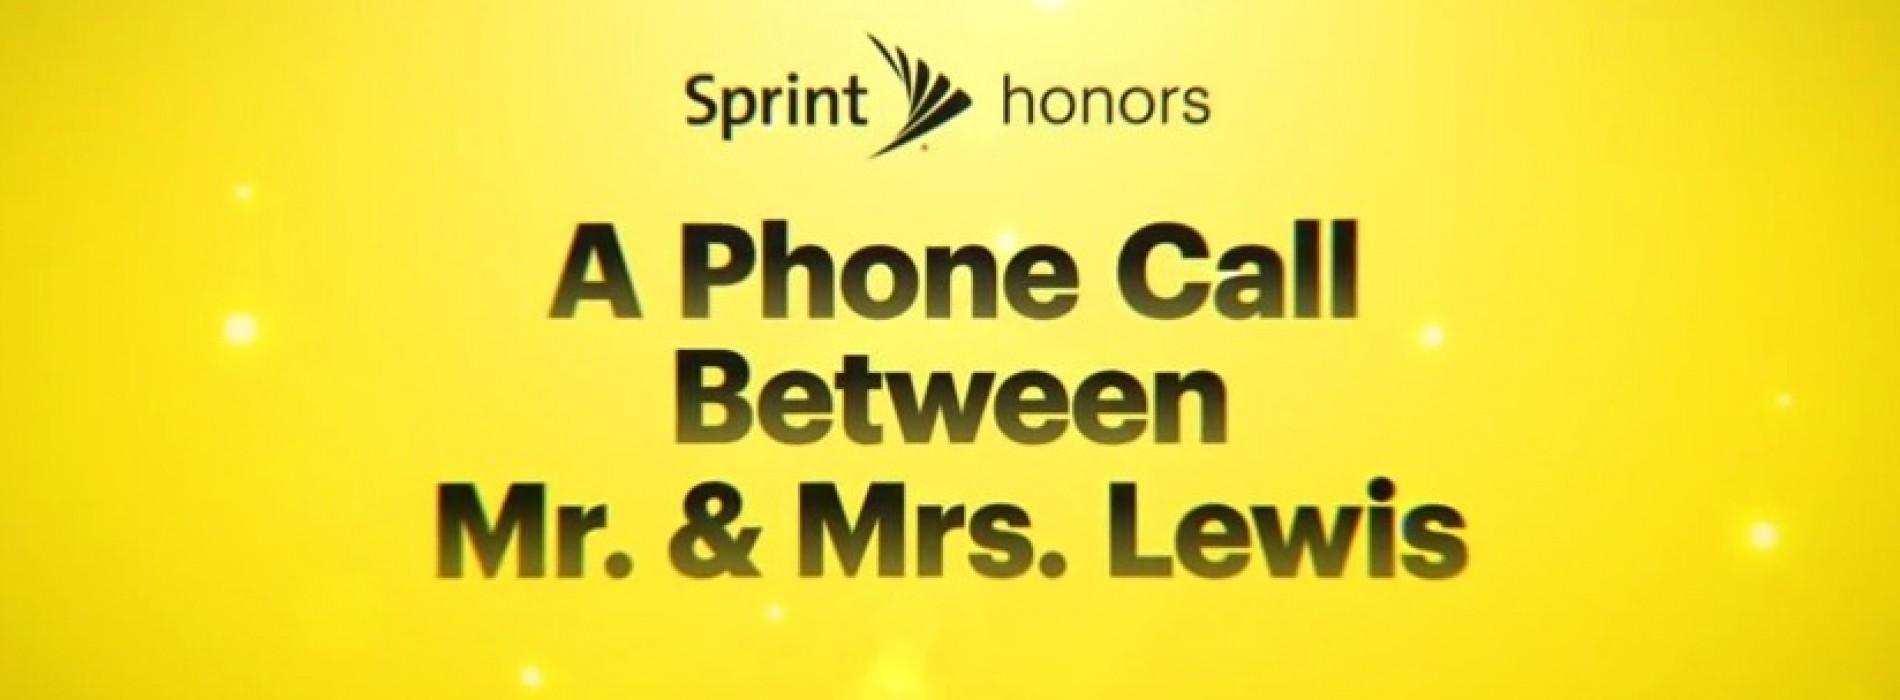 Sprint OneUp ad with James Earl Jones, Malcom McDowell